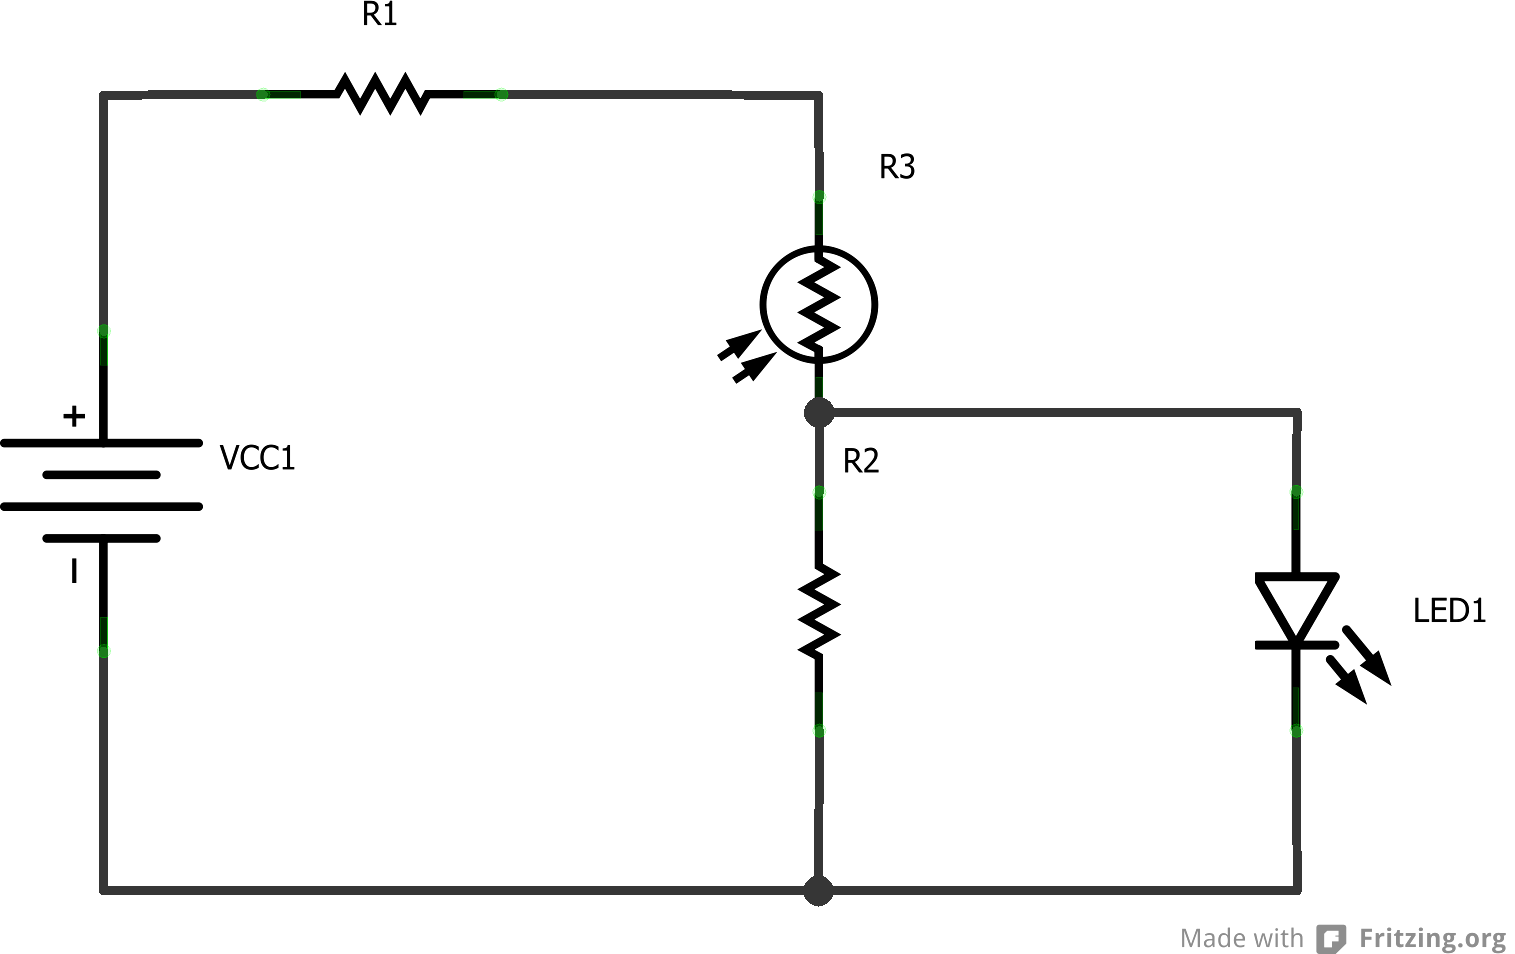 led circuit diagram lighting control panel wiring symbol schematic